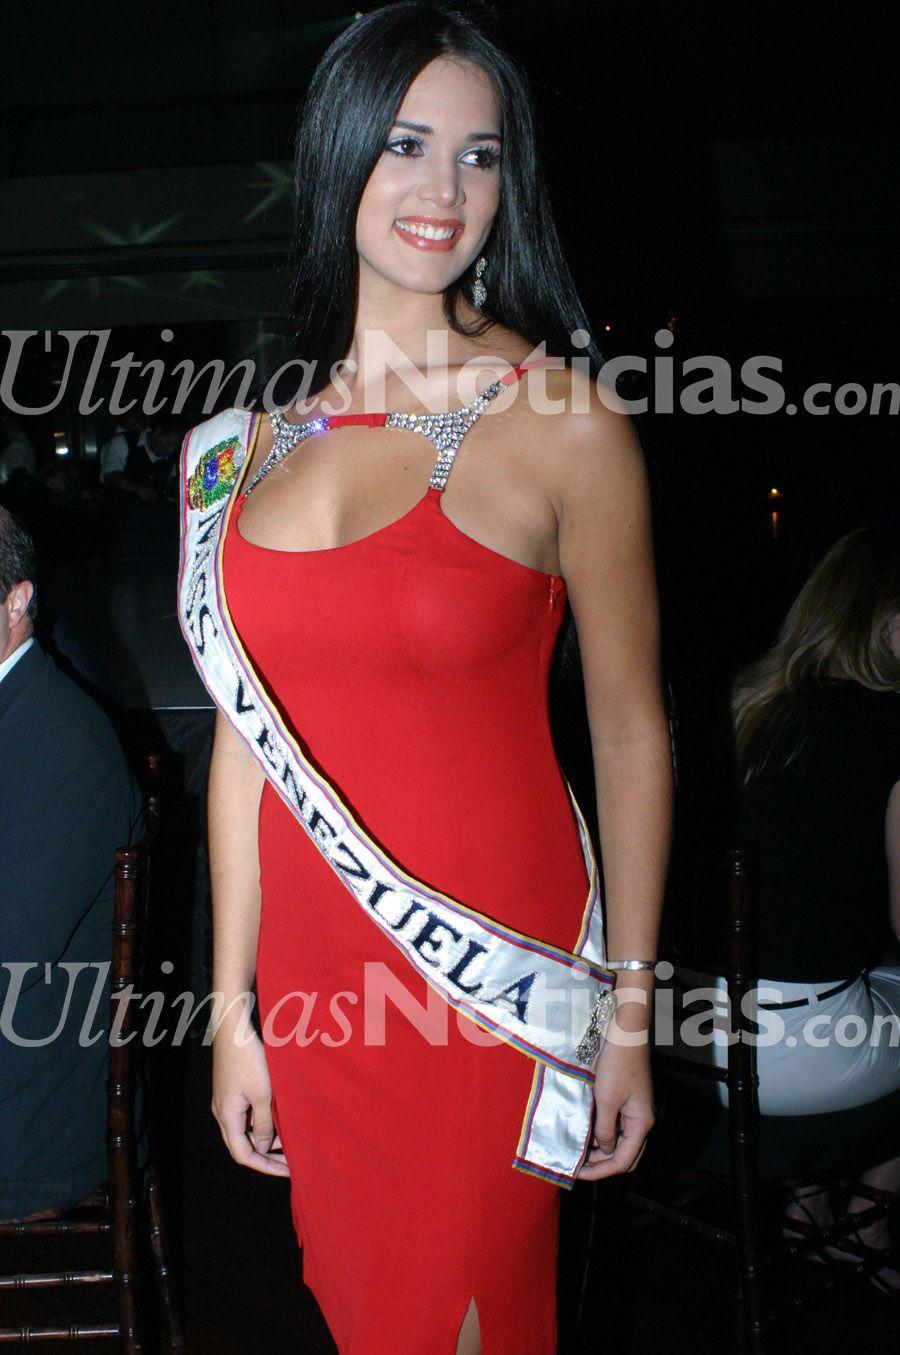 monica spear, top 5 de miss universe 2005. † - Página 15 3e9cb110